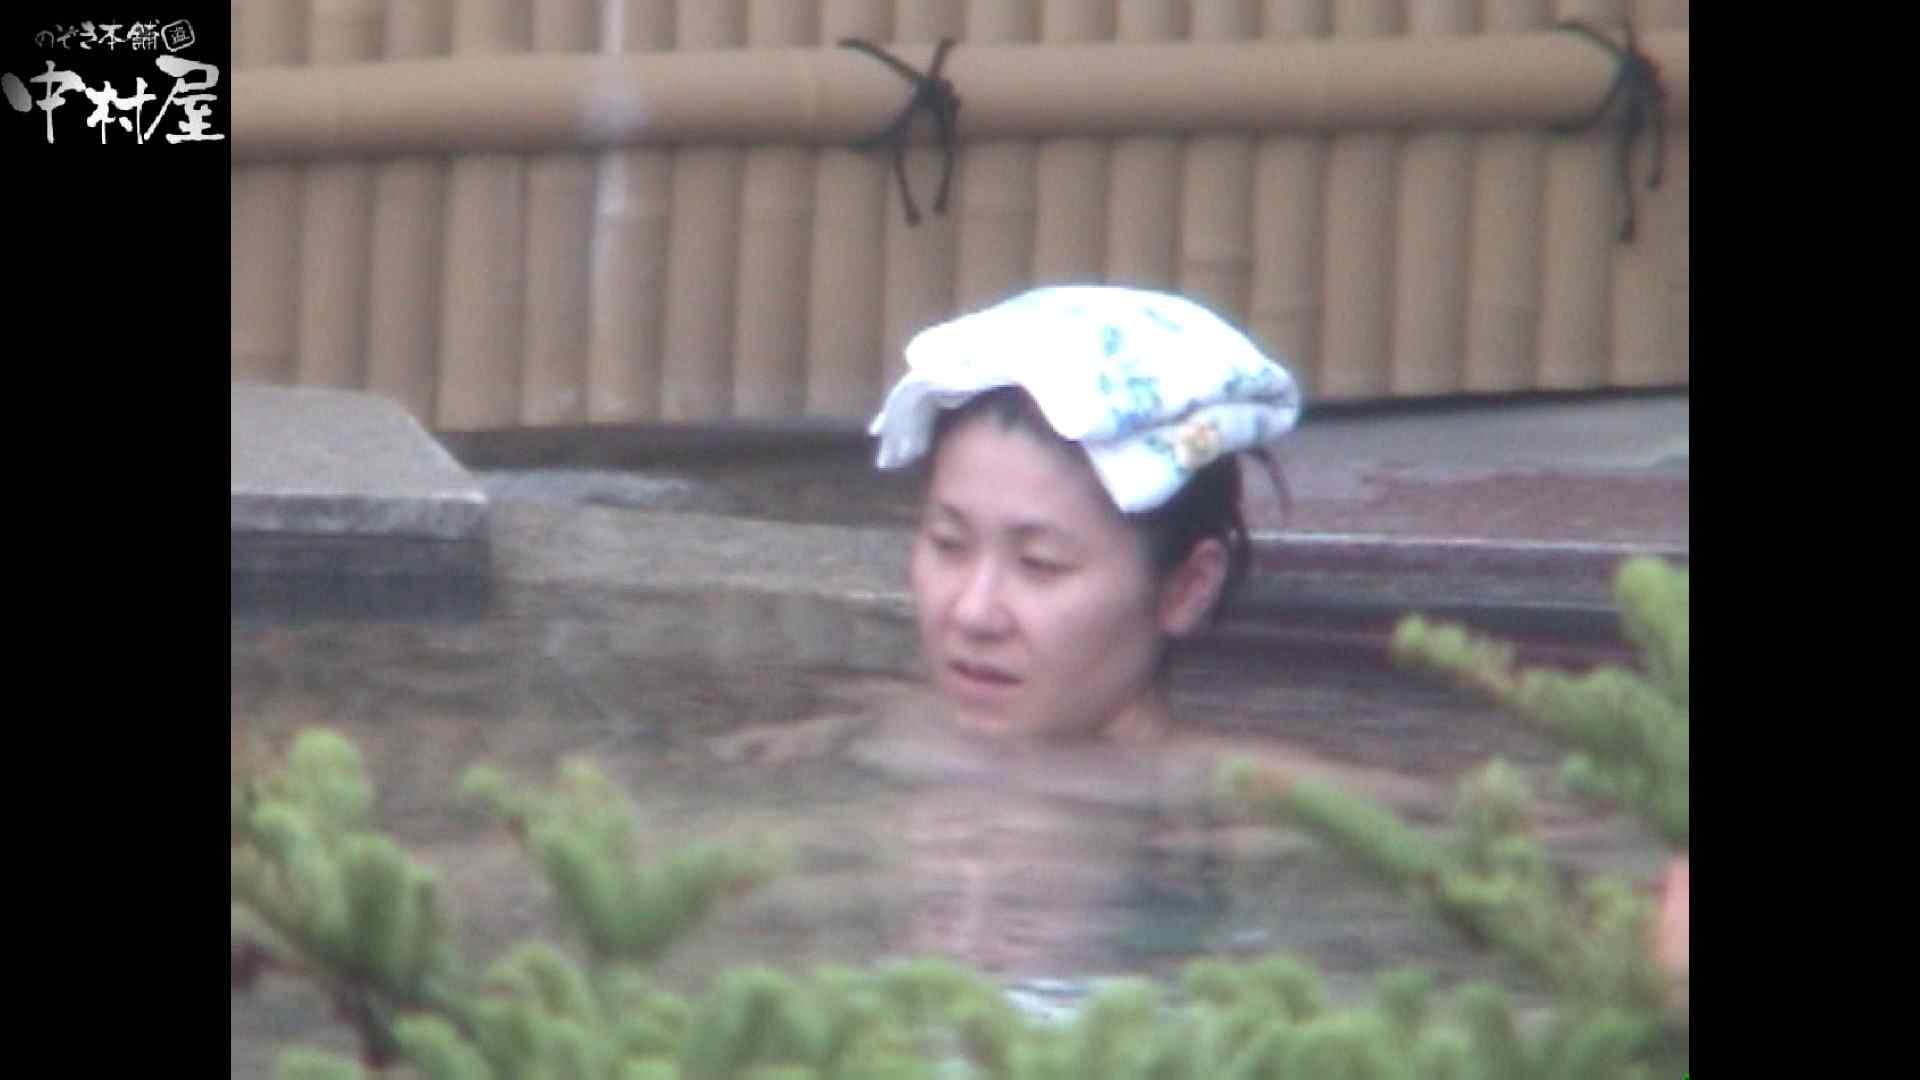 Aquaな露天風呂Vol.925 盗撮   OLセックス  52画像 49